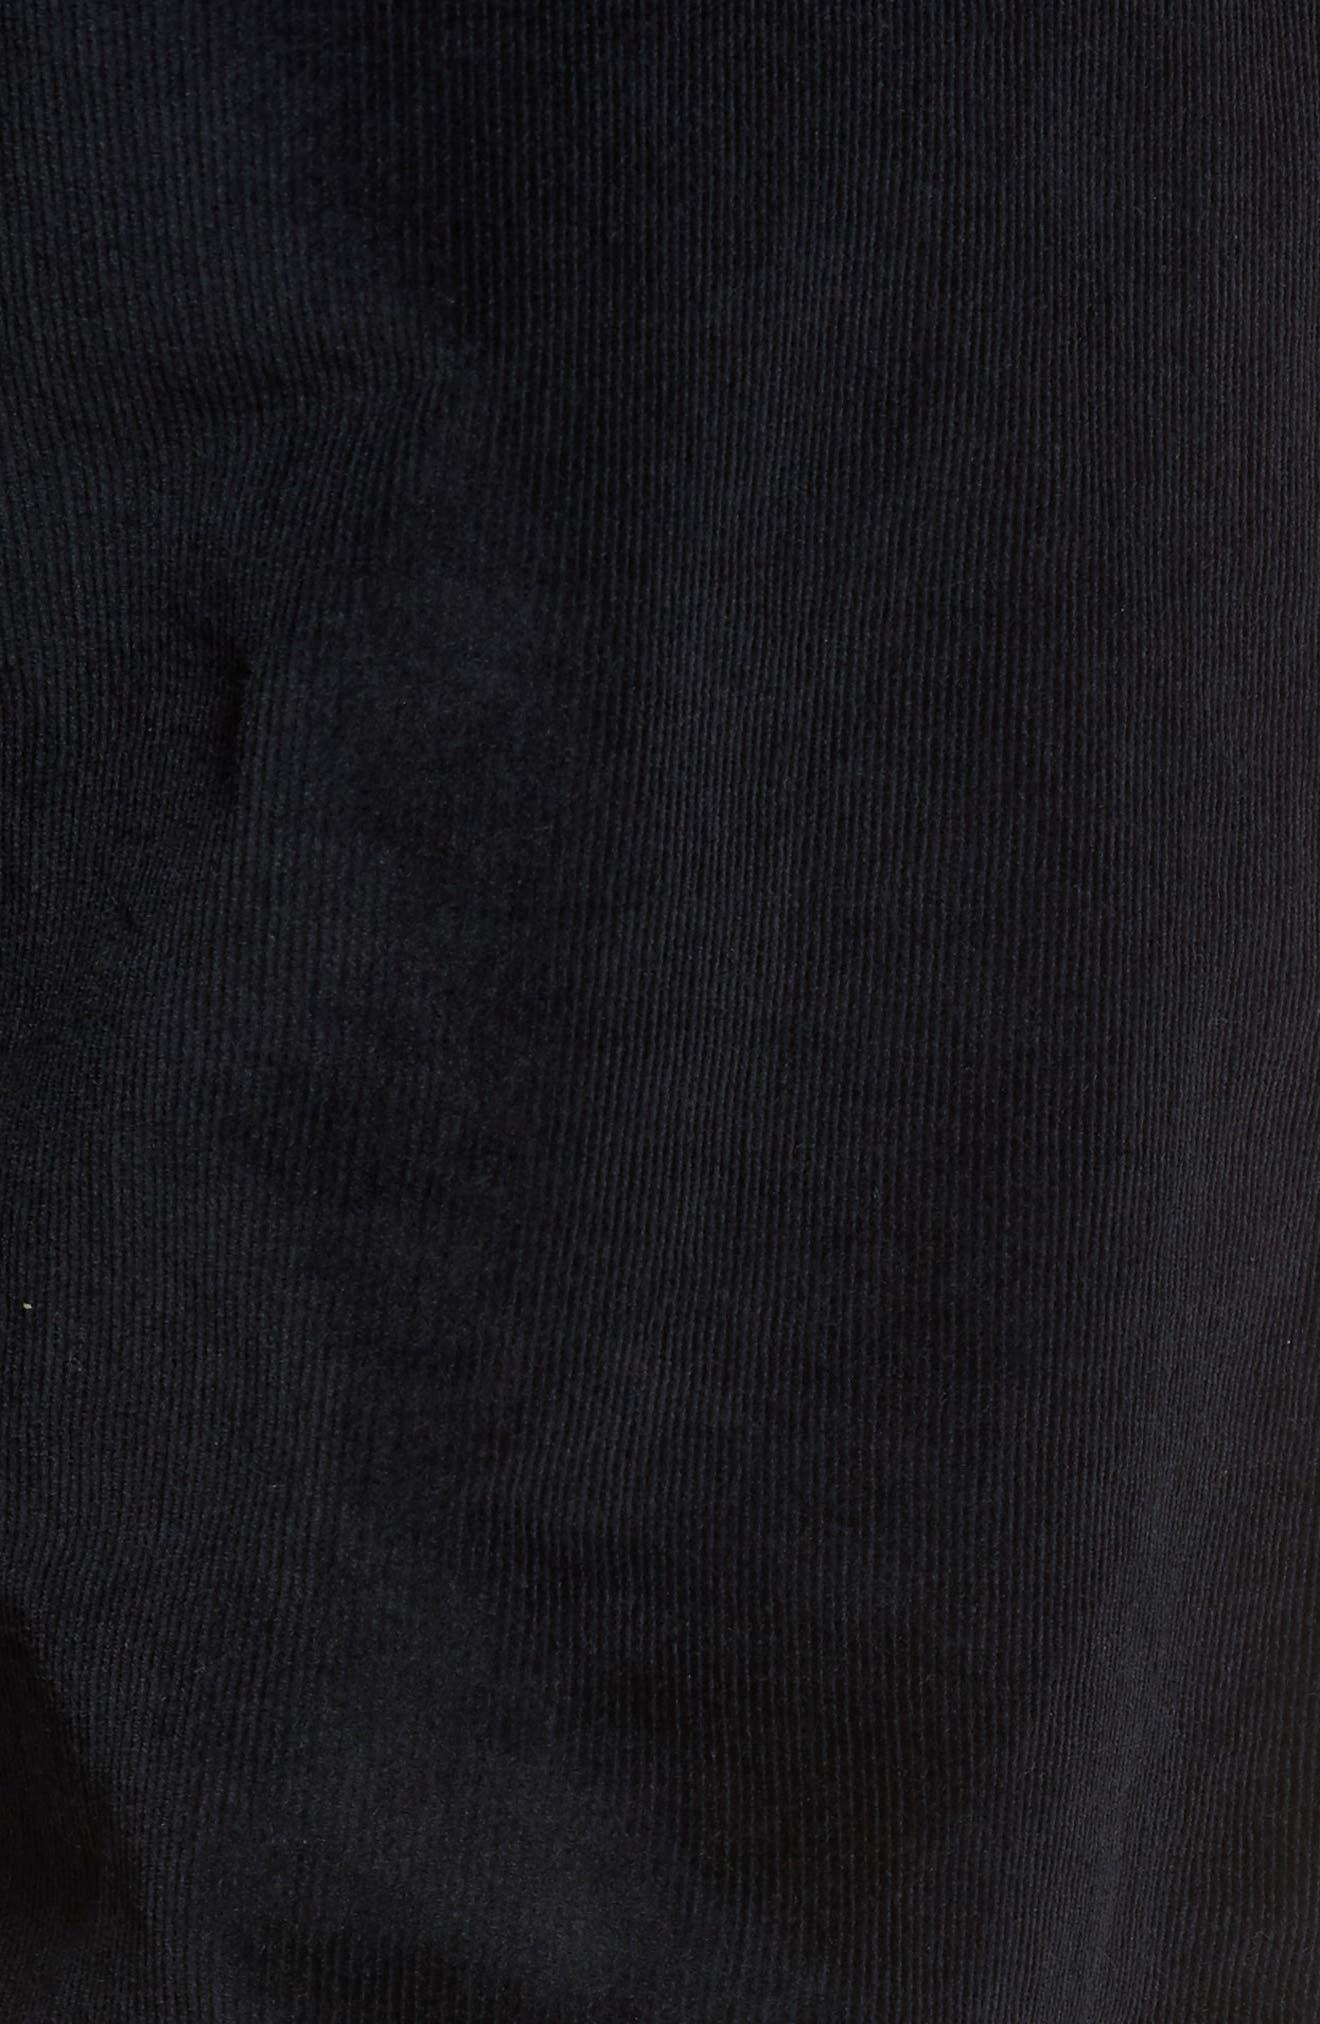 Naked & Famous Slim Chino Slim Fit Corduroy Pants,                             Alternate thumbnail 5, color,